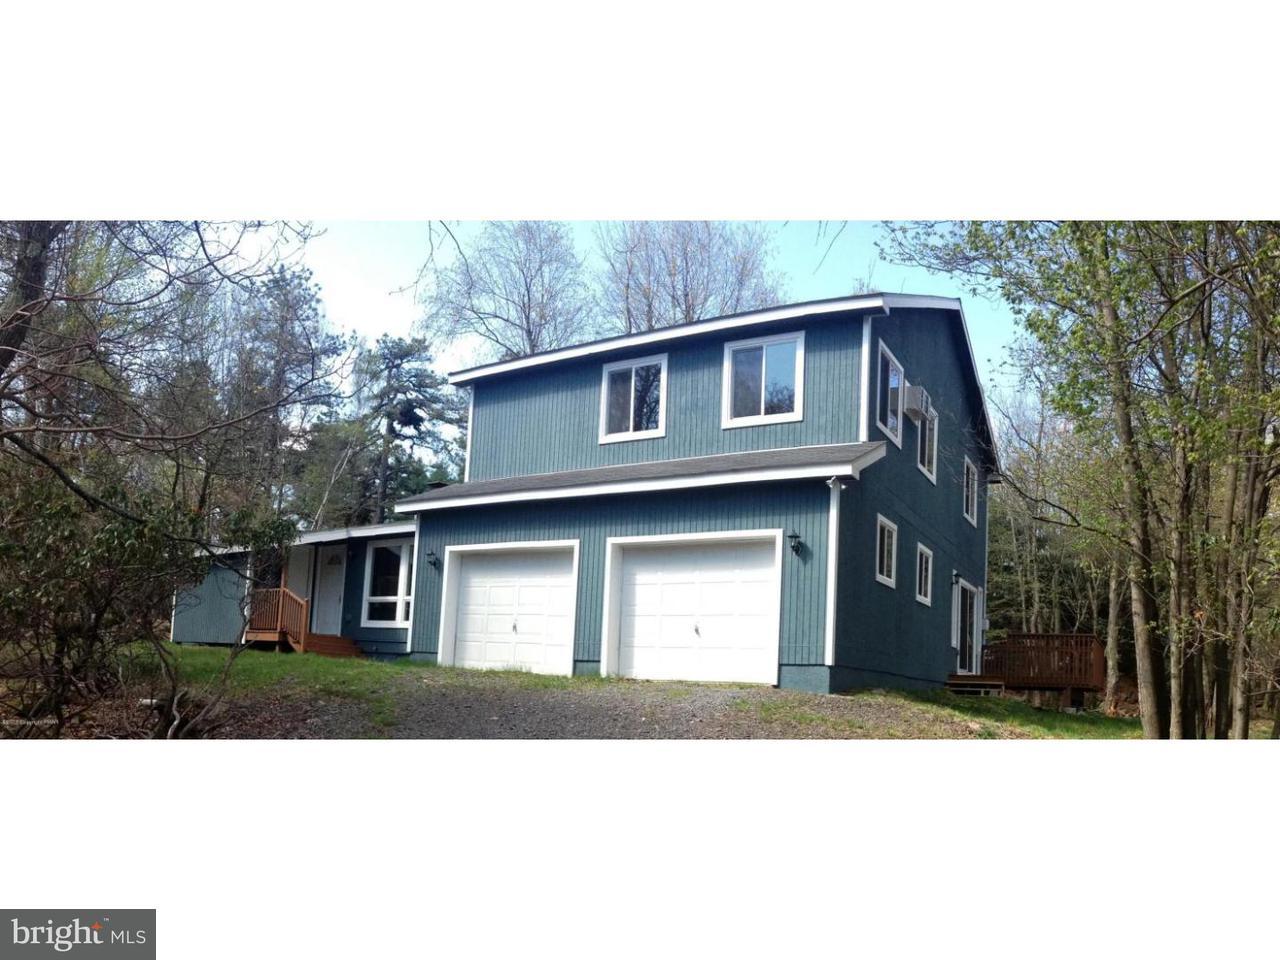 Single Family Home for Sale at 12 HICKORY Road Lake Harmony, Pennsylvania 18624 United States